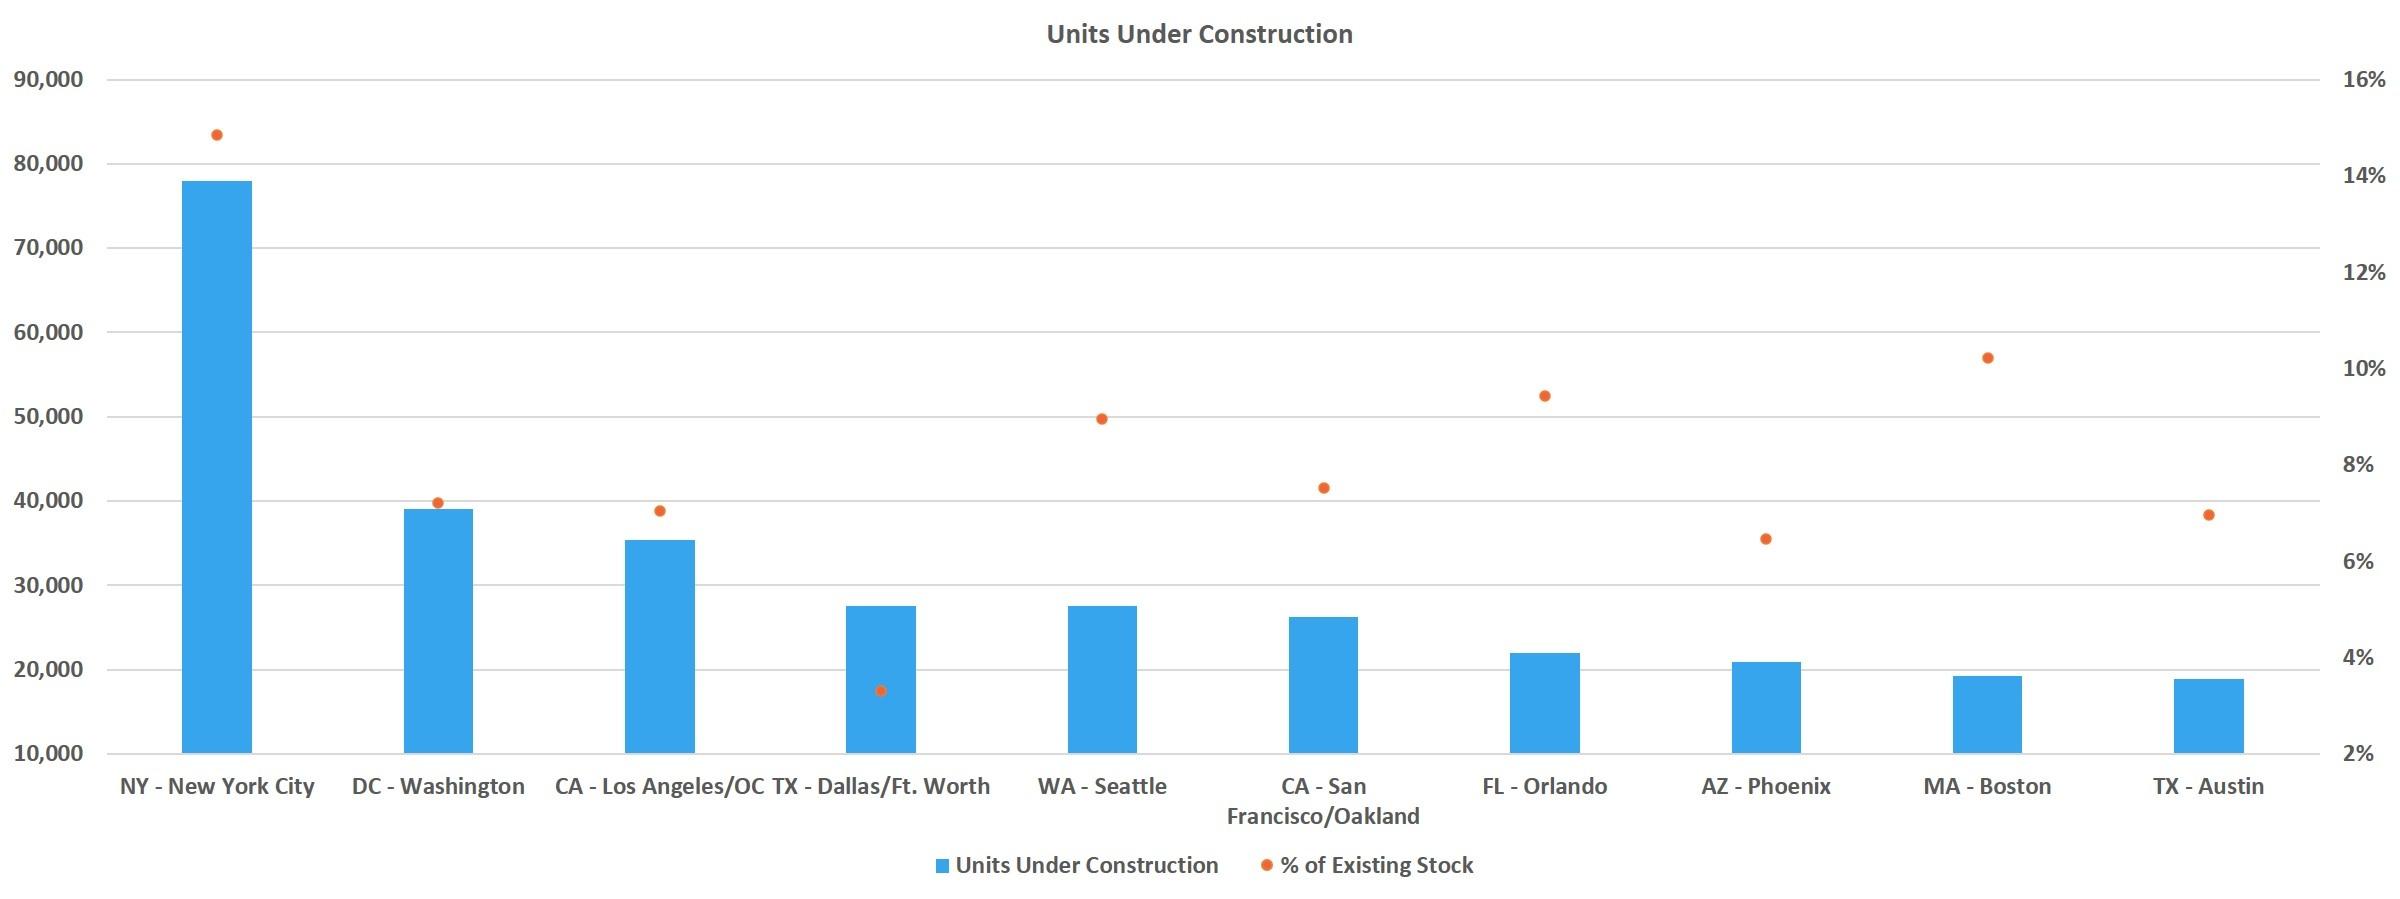 Units Under Construction